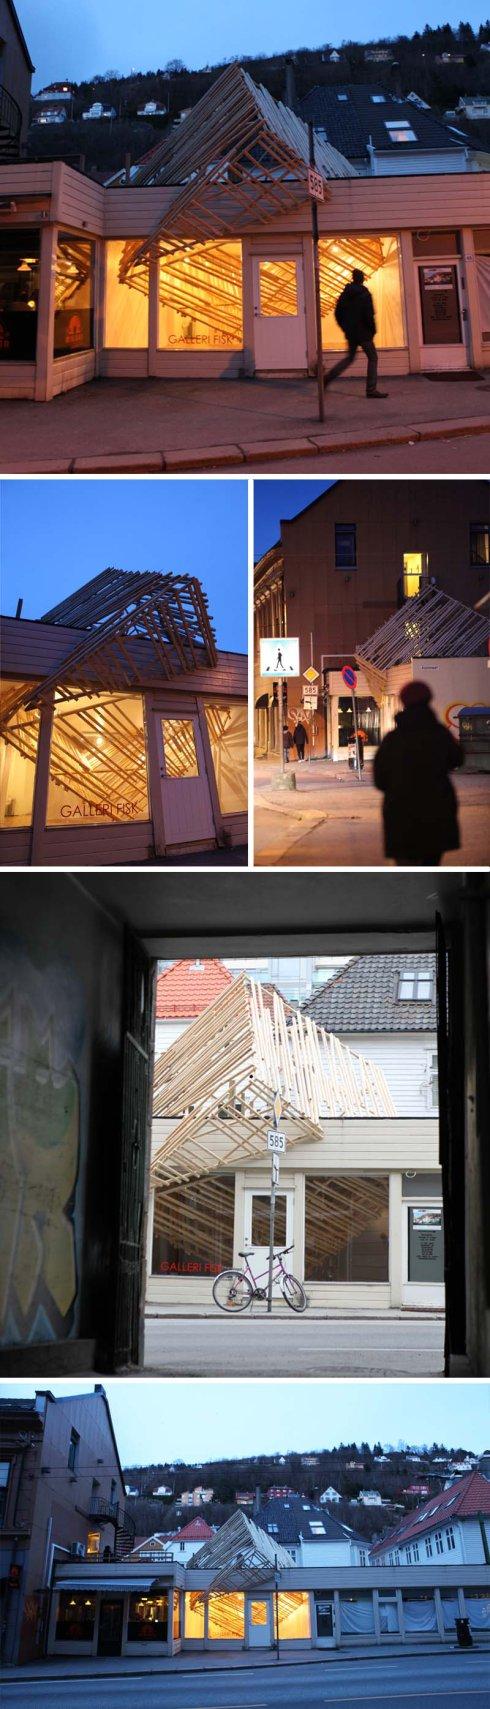 Fragile Invasion, Hidemi Nishida Studio, Norway, Cool wood structure through gallery roof